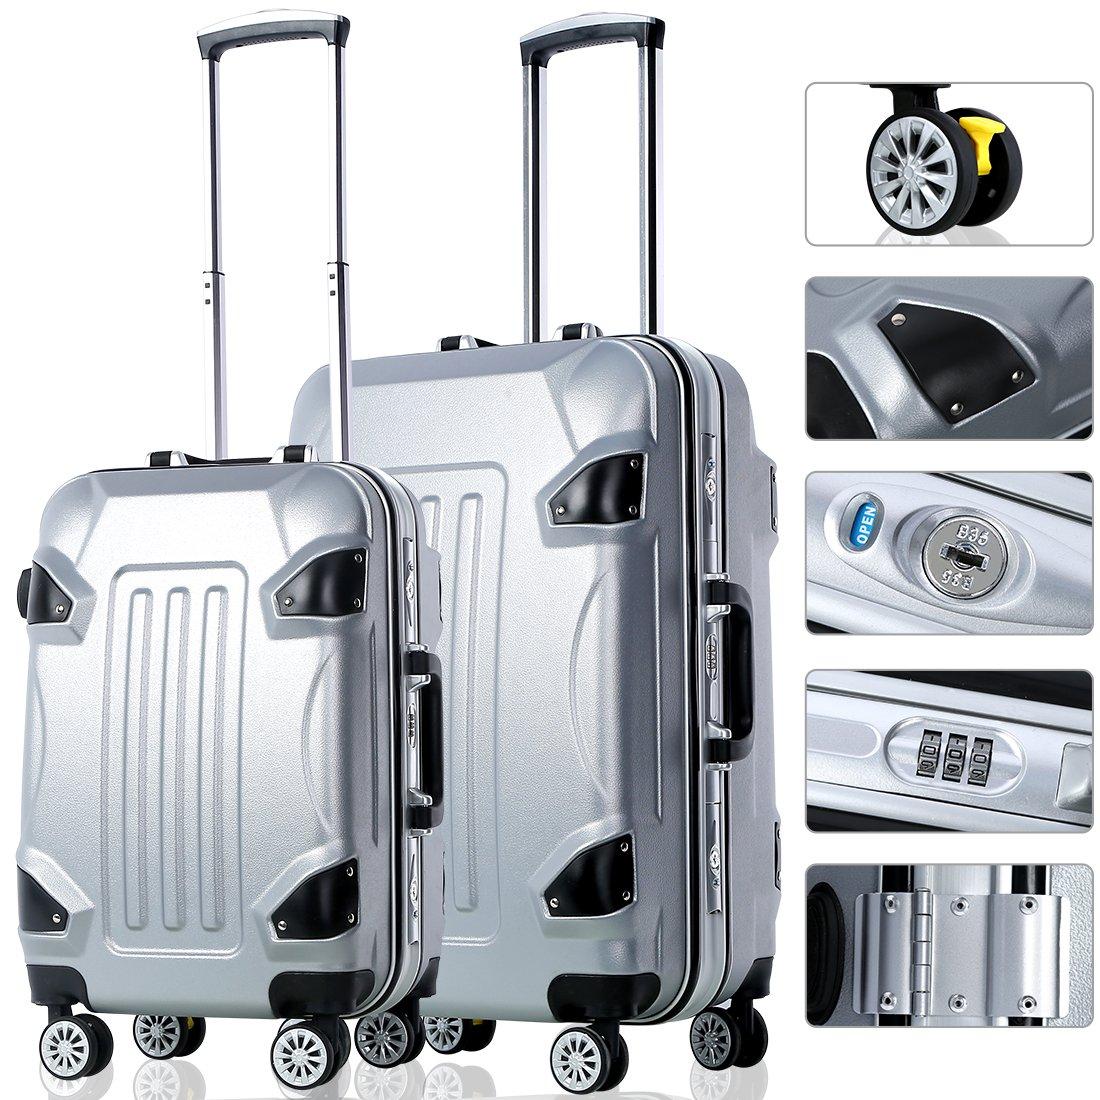 2 Piece Travel Luggage Set Travel Luggage Bag With TSA Lock Spinner Hard Shell Lightweight Suitcase Luggage Travel Bag (Grey)